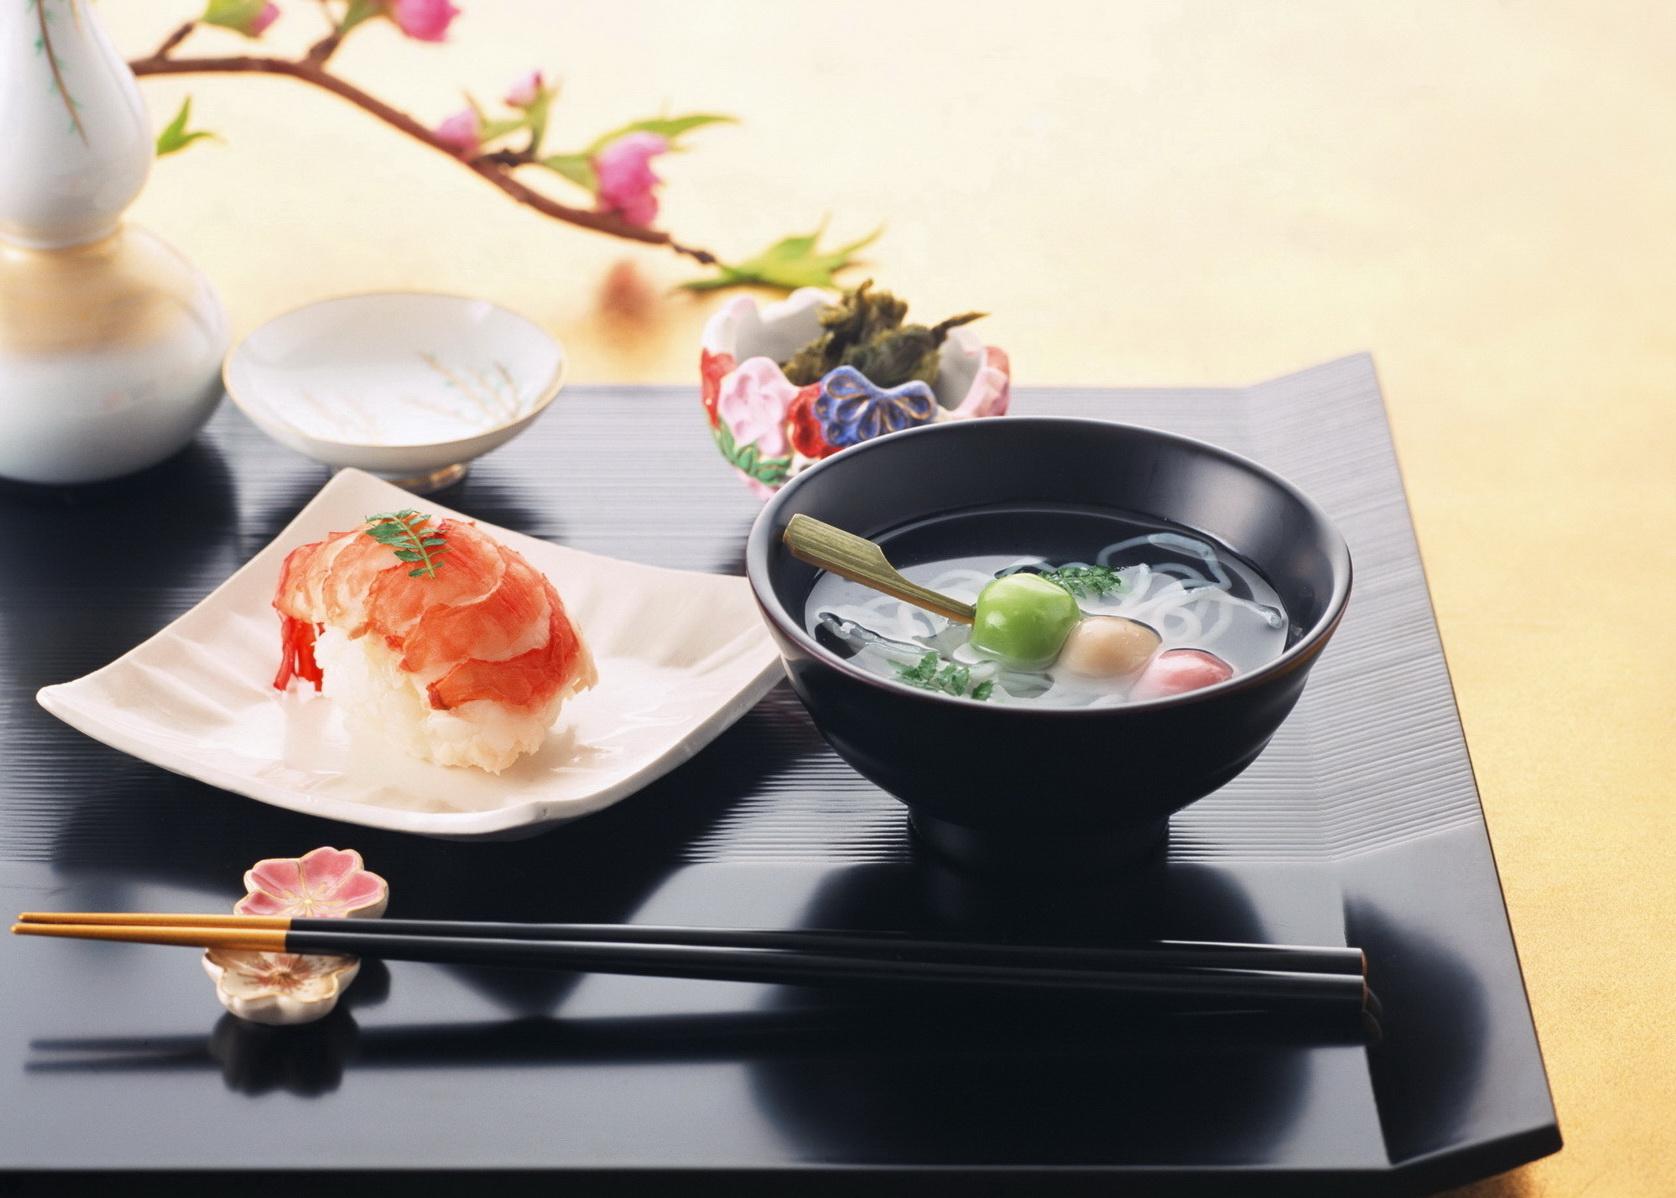 доставка суши на дом бесплатно